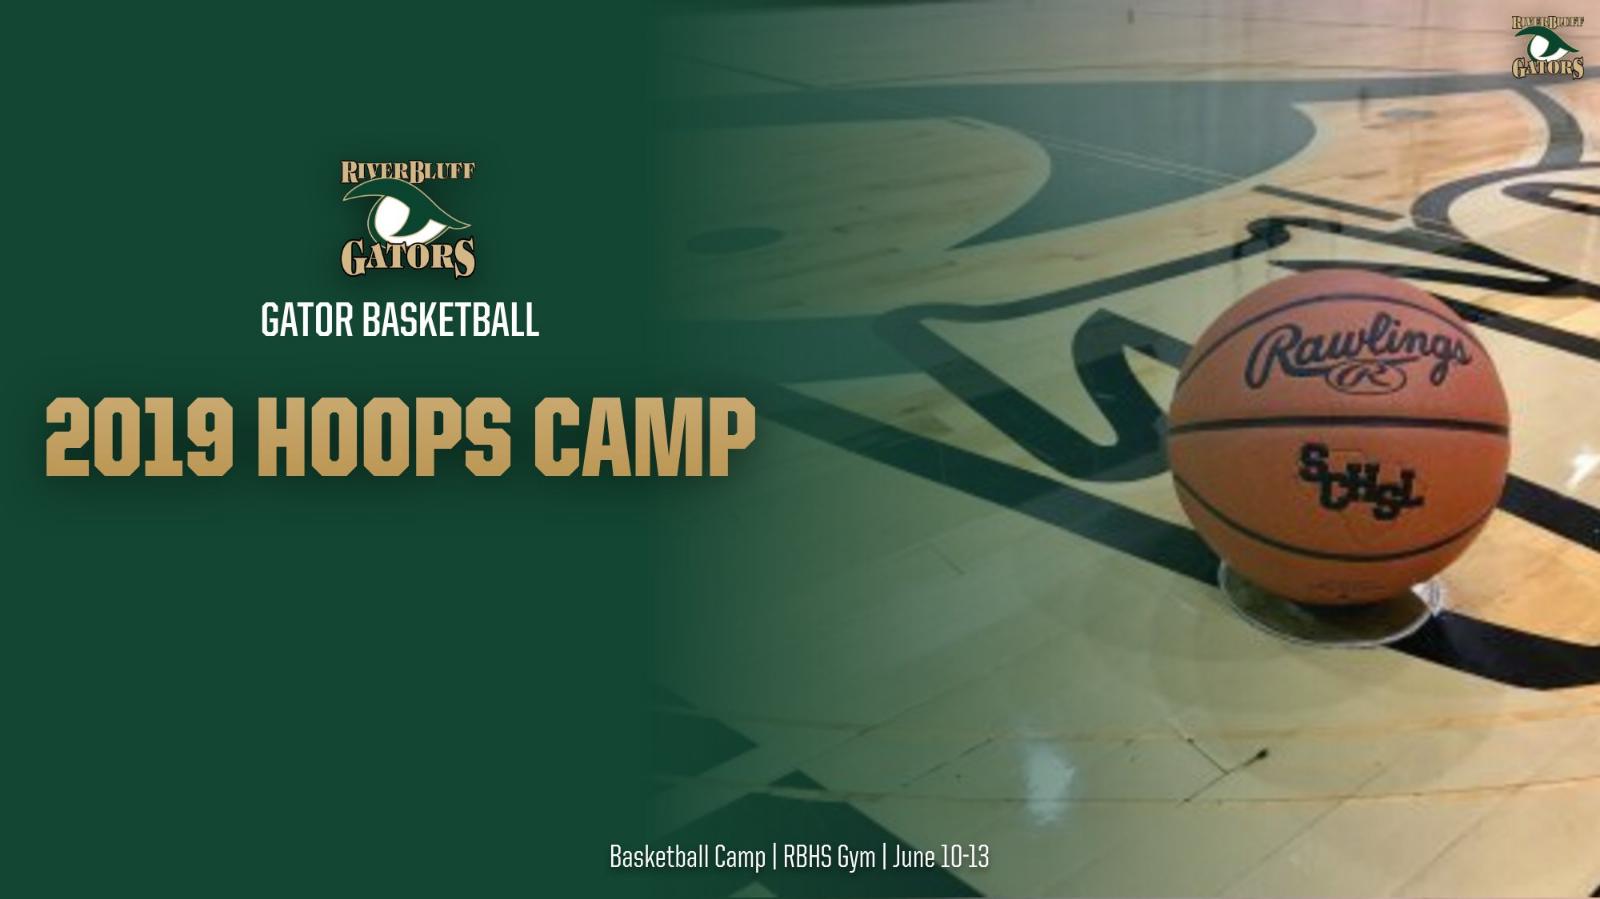 2019 Gators Basketball Camp Dates Announced